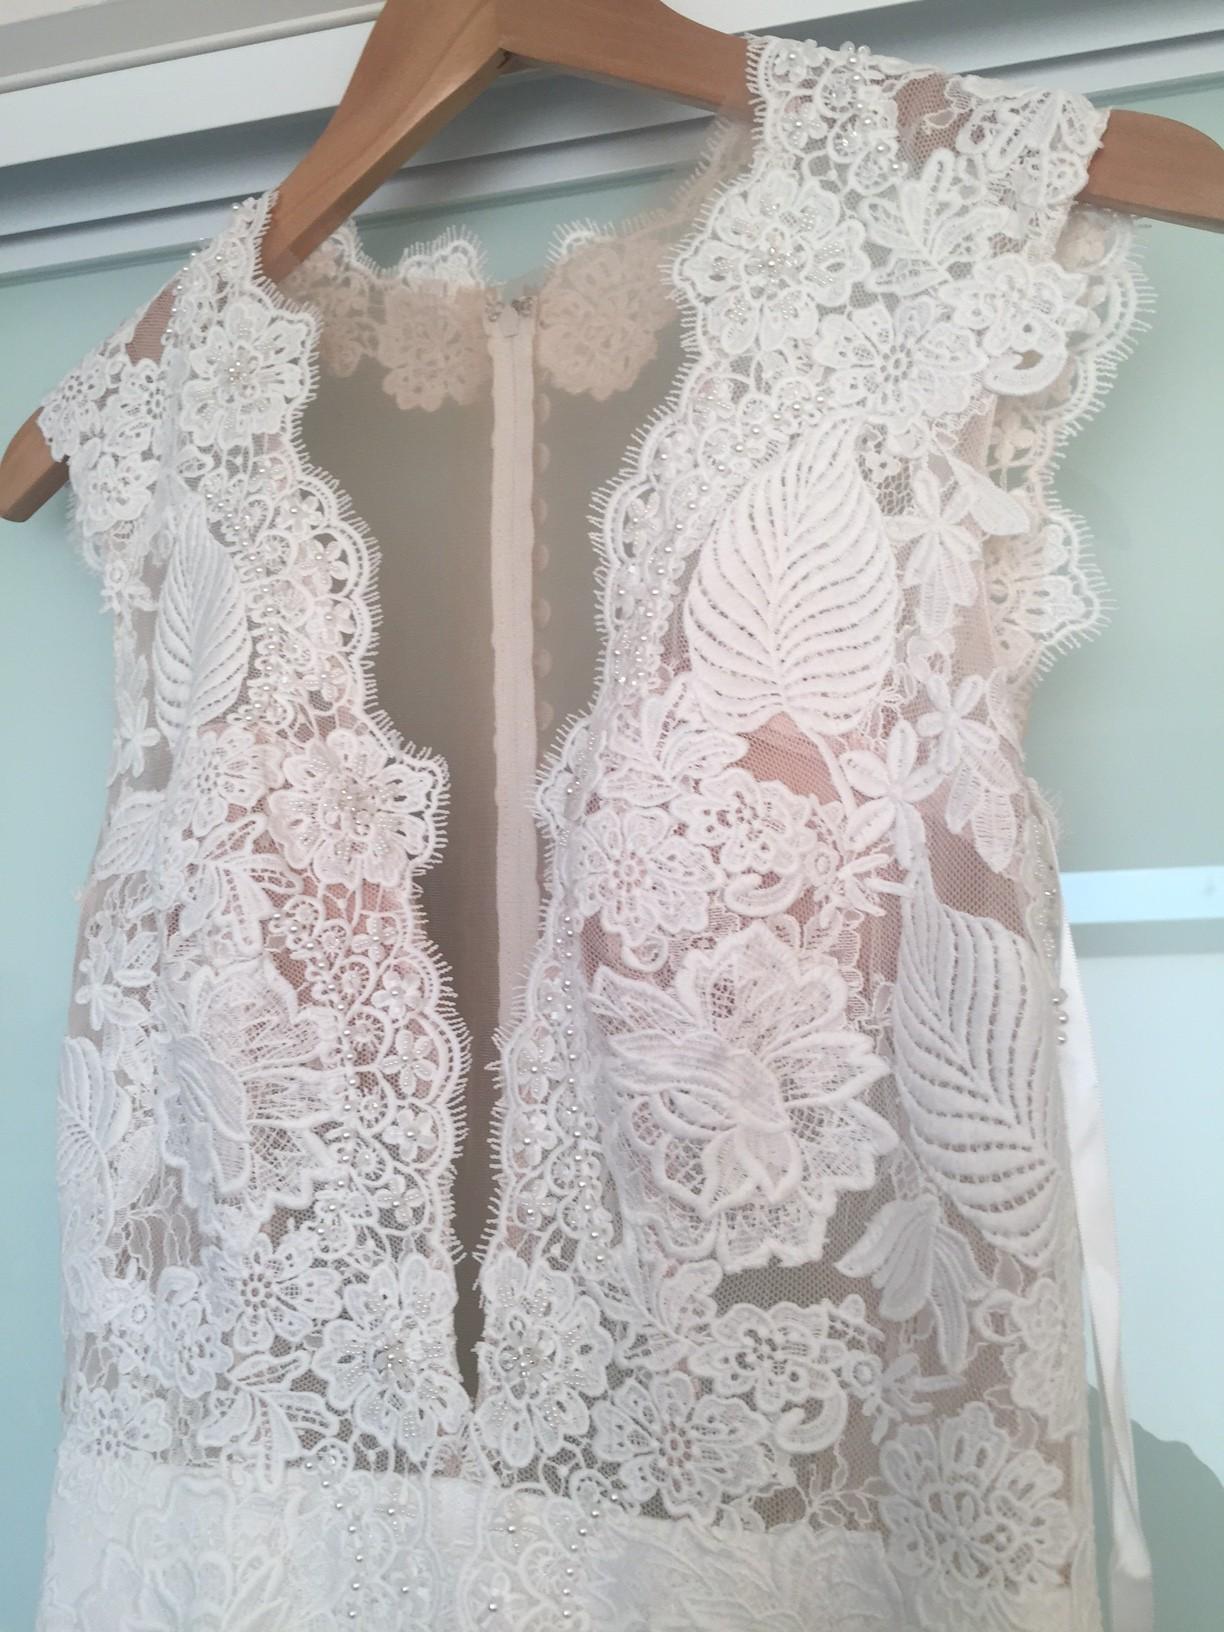 Cizzy Bridal Zb119 Zavana Bridal New Wedding Dress On